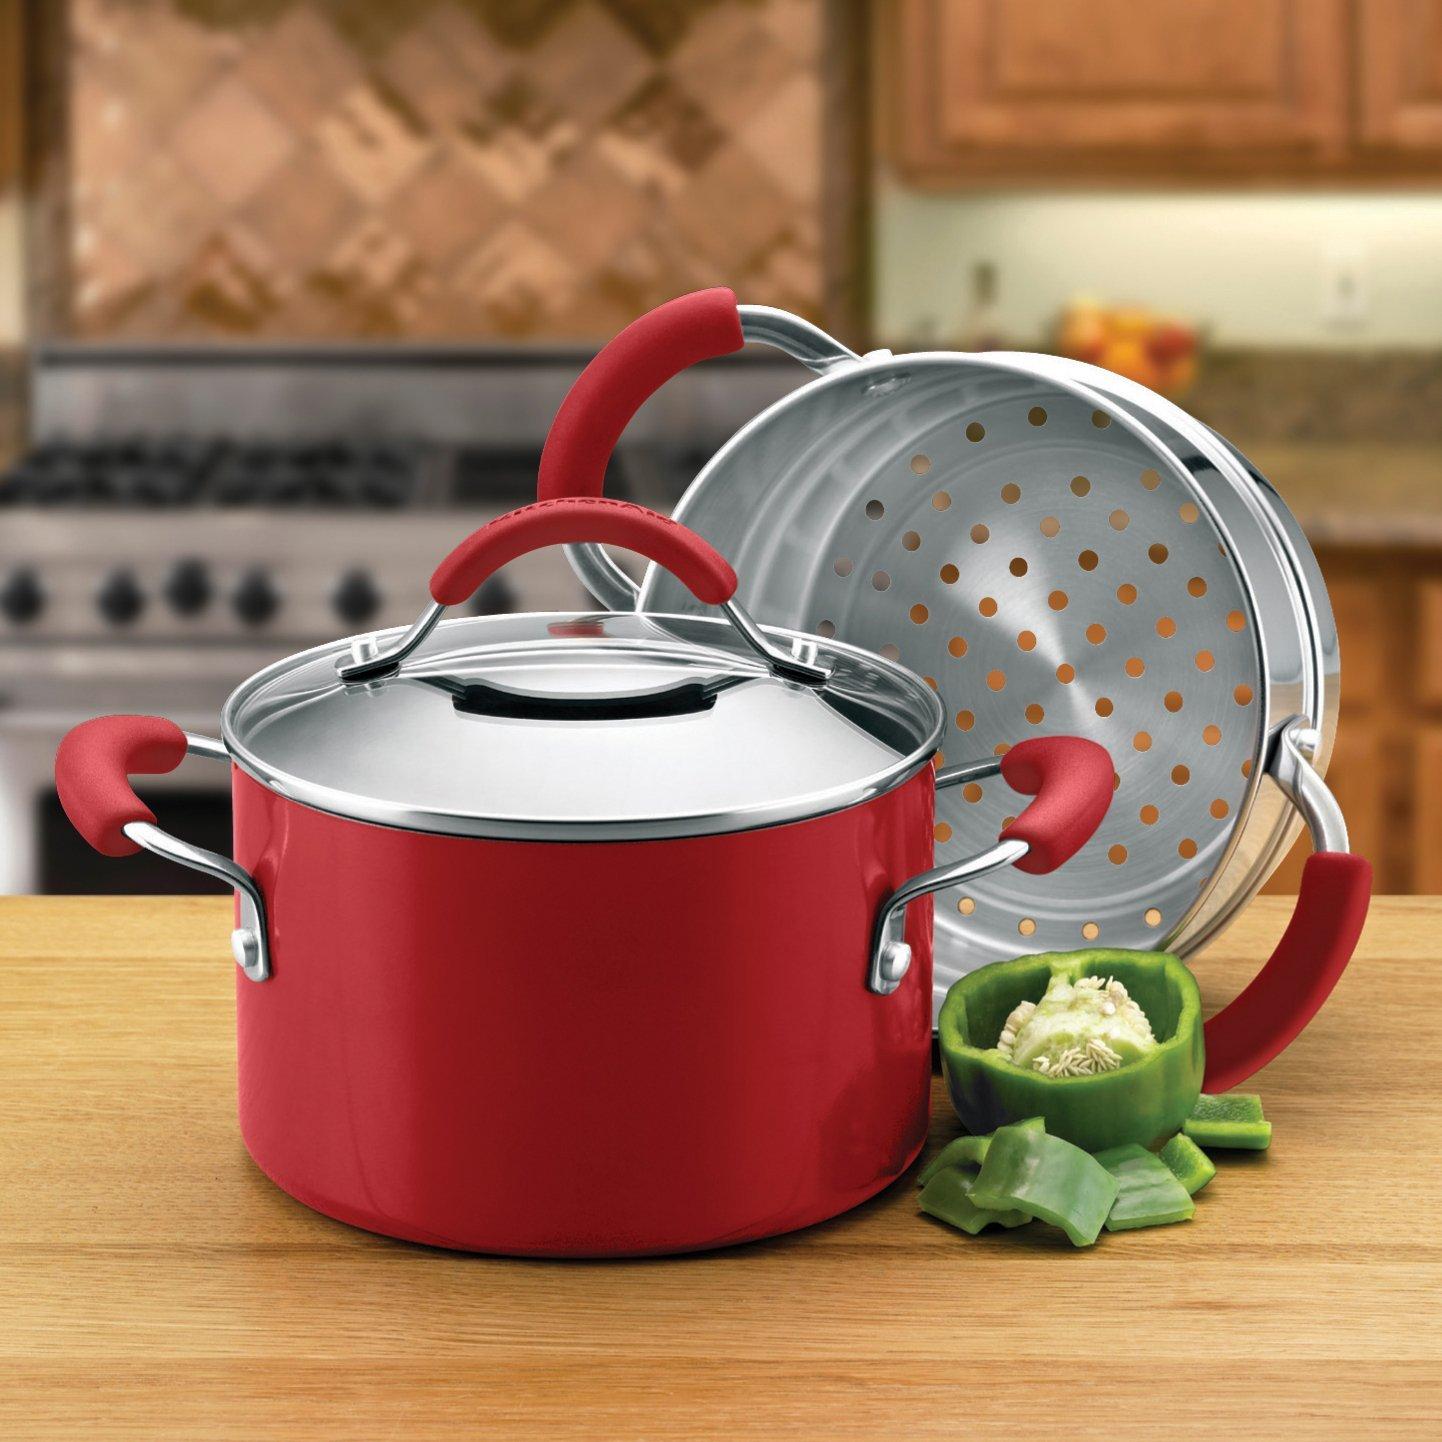 Kitchenaid Heavy Gauge Aluminum Pot With Stainless Steel